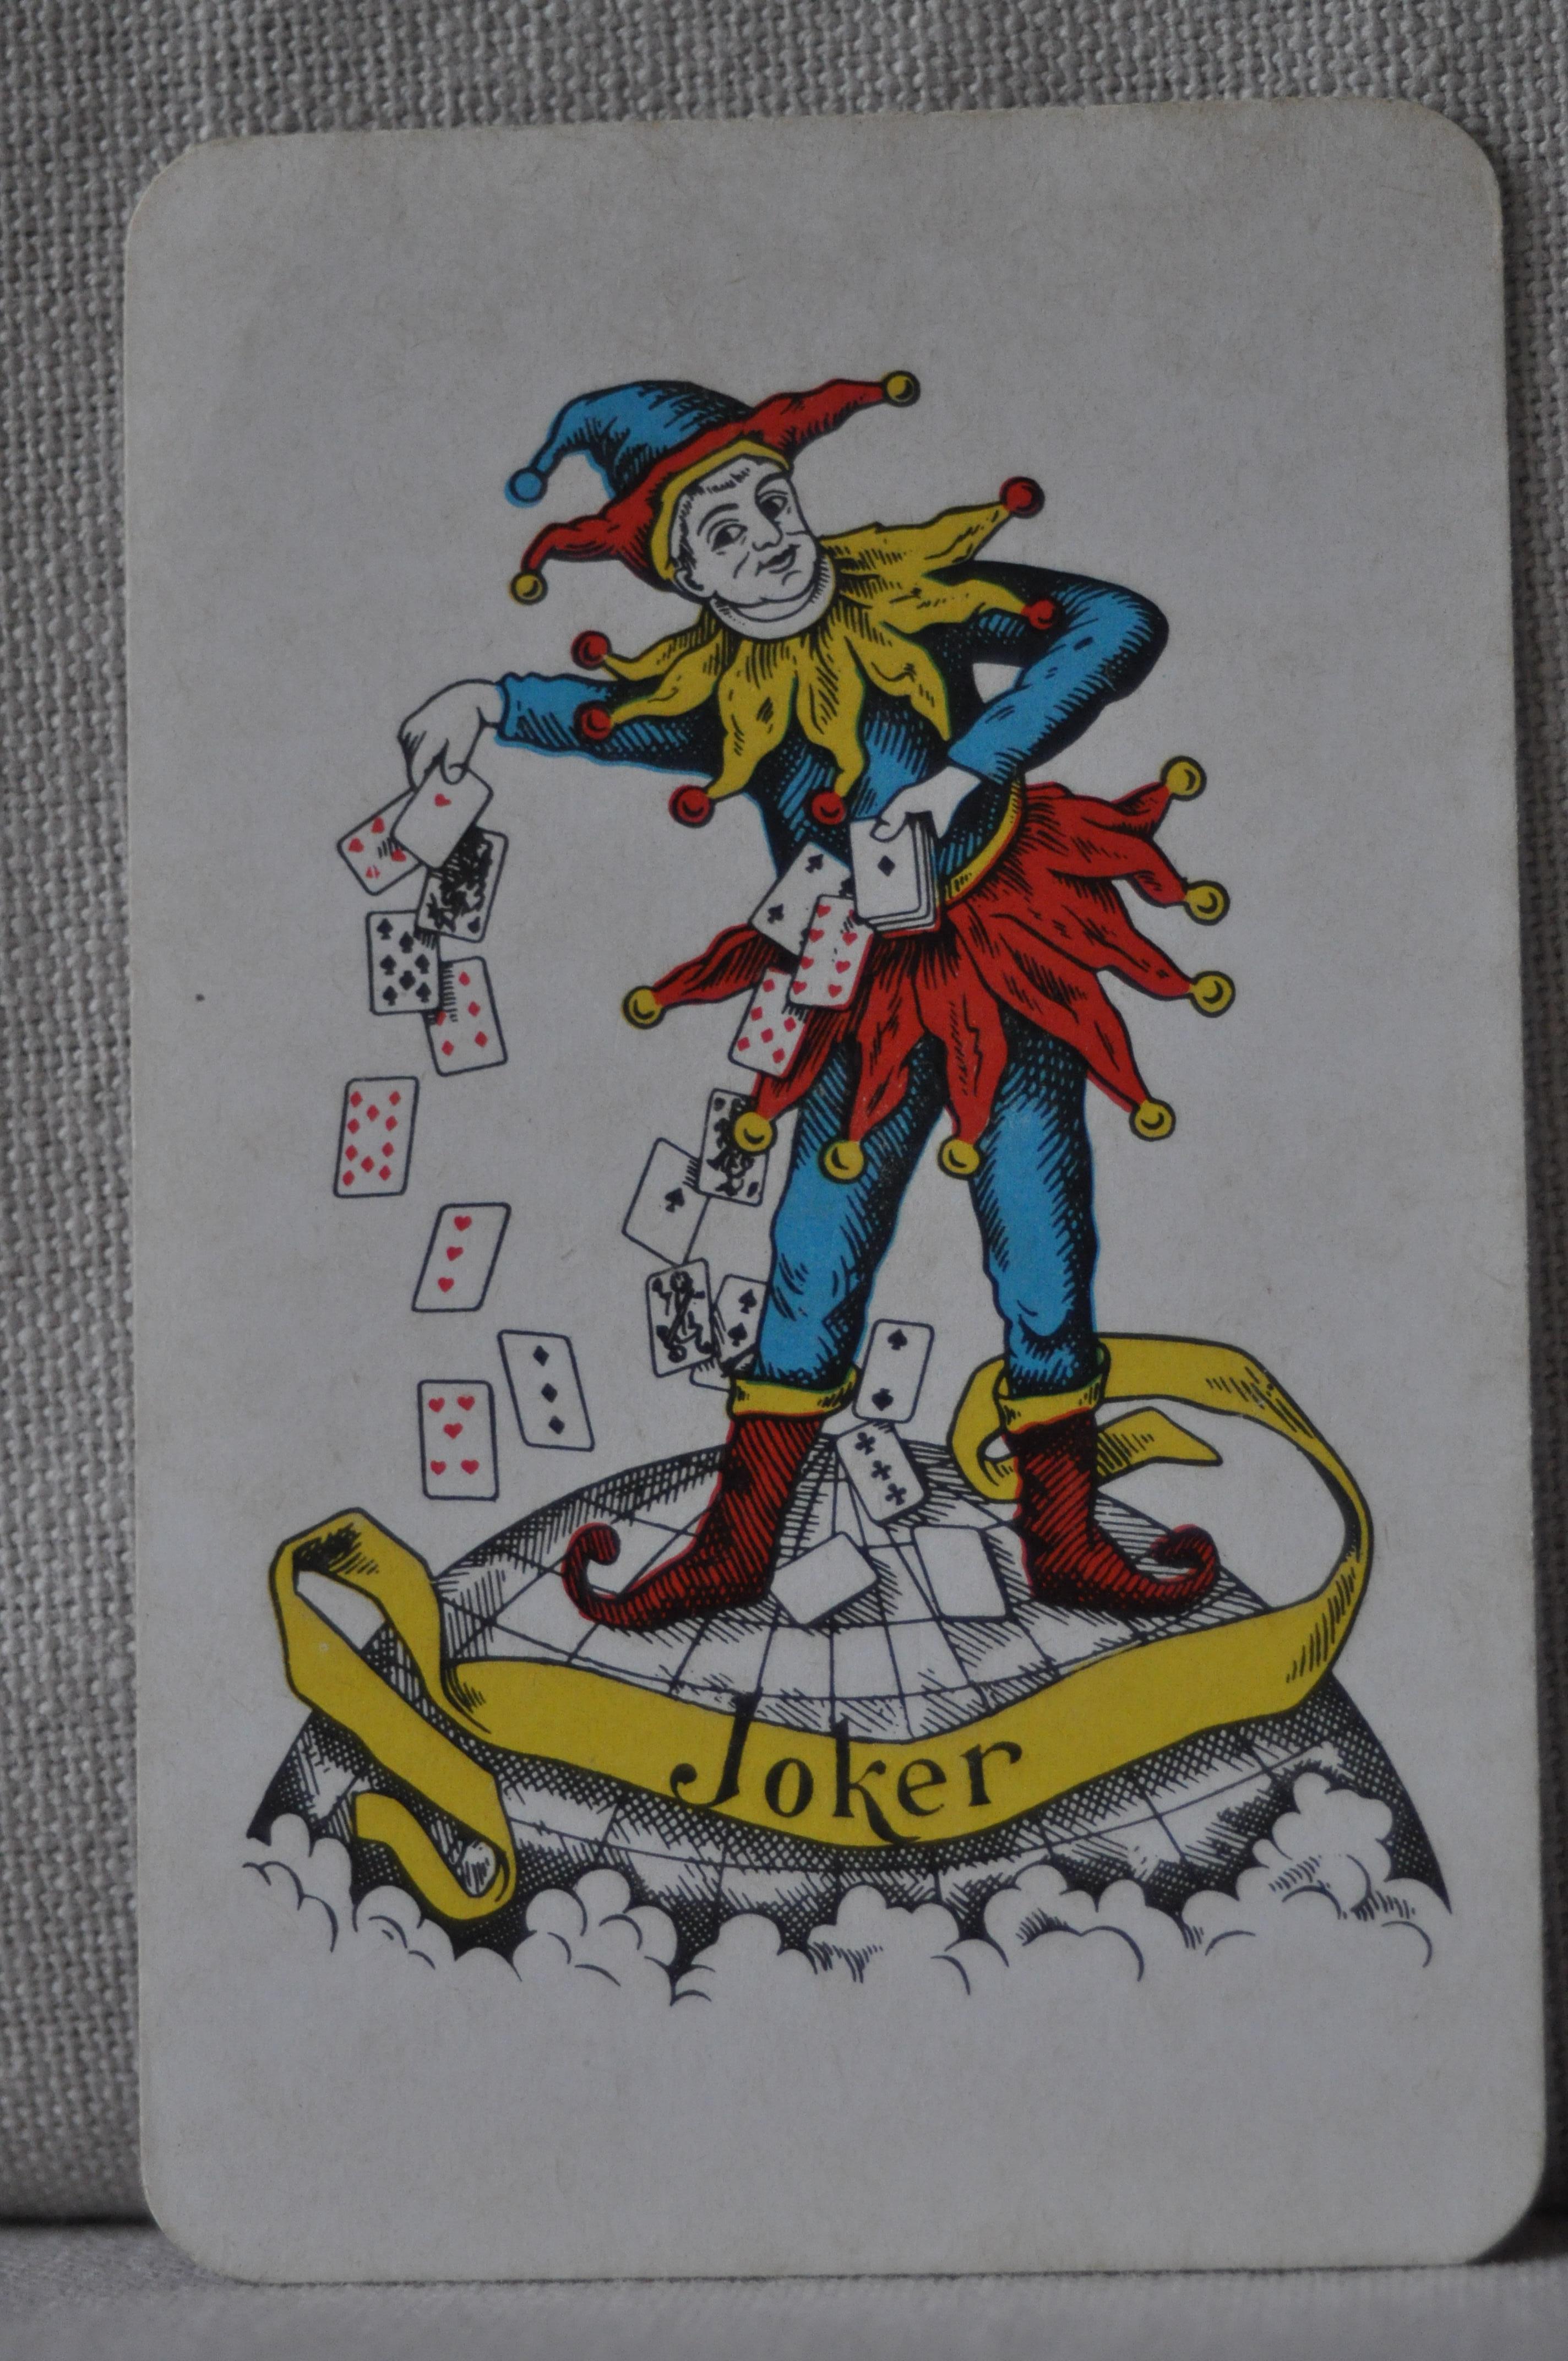 Joker (джокер)